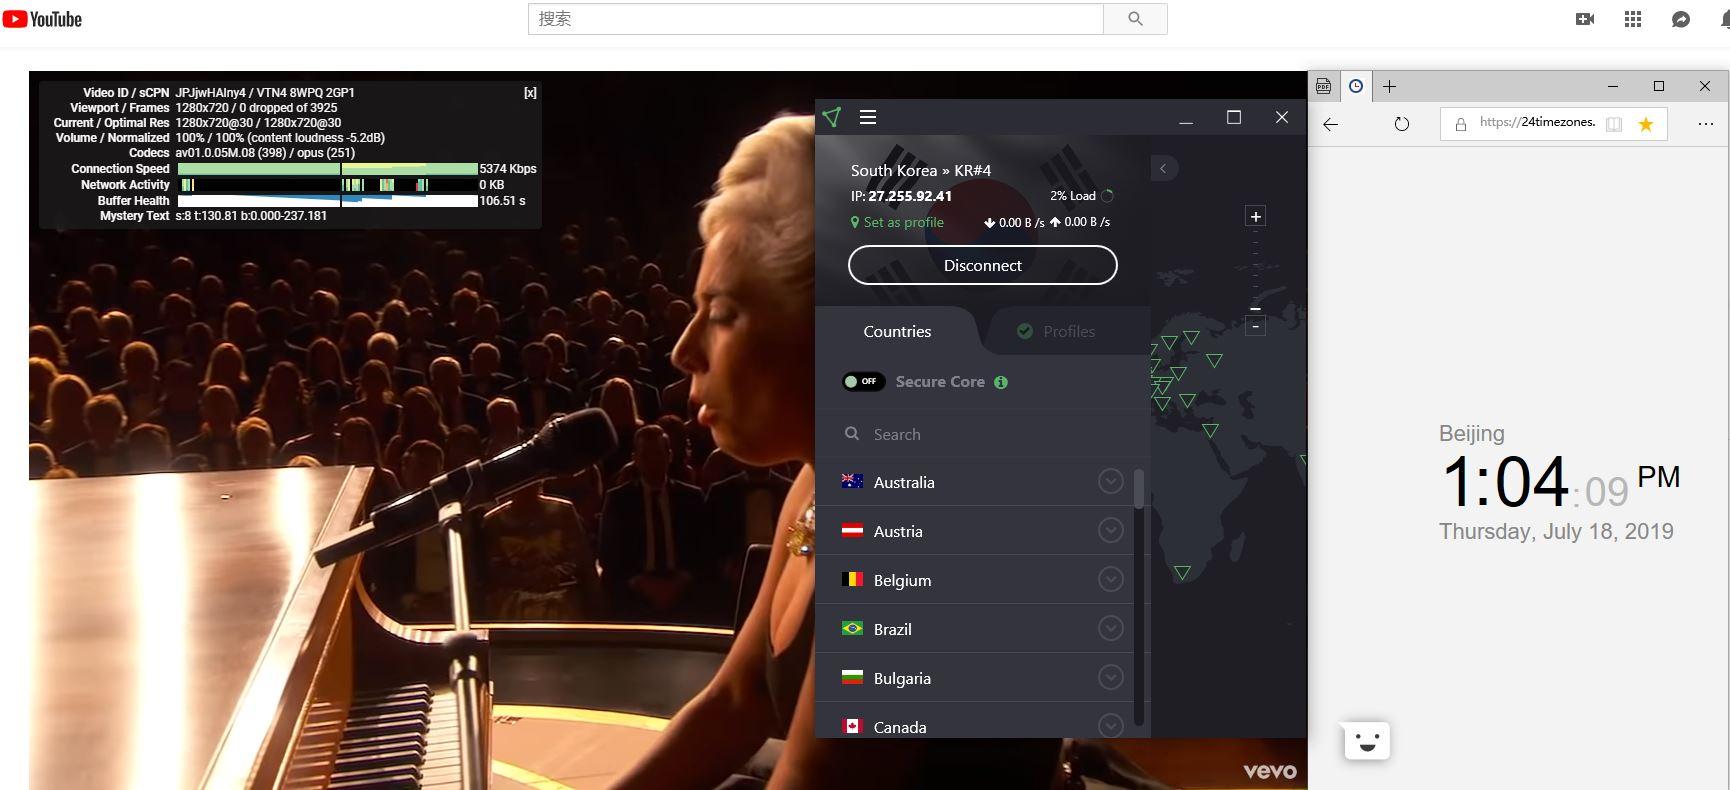 Protonvpn Windows 翻墙 科学上网 韩国Kr#4服务器 YouTube速度测试-20190718